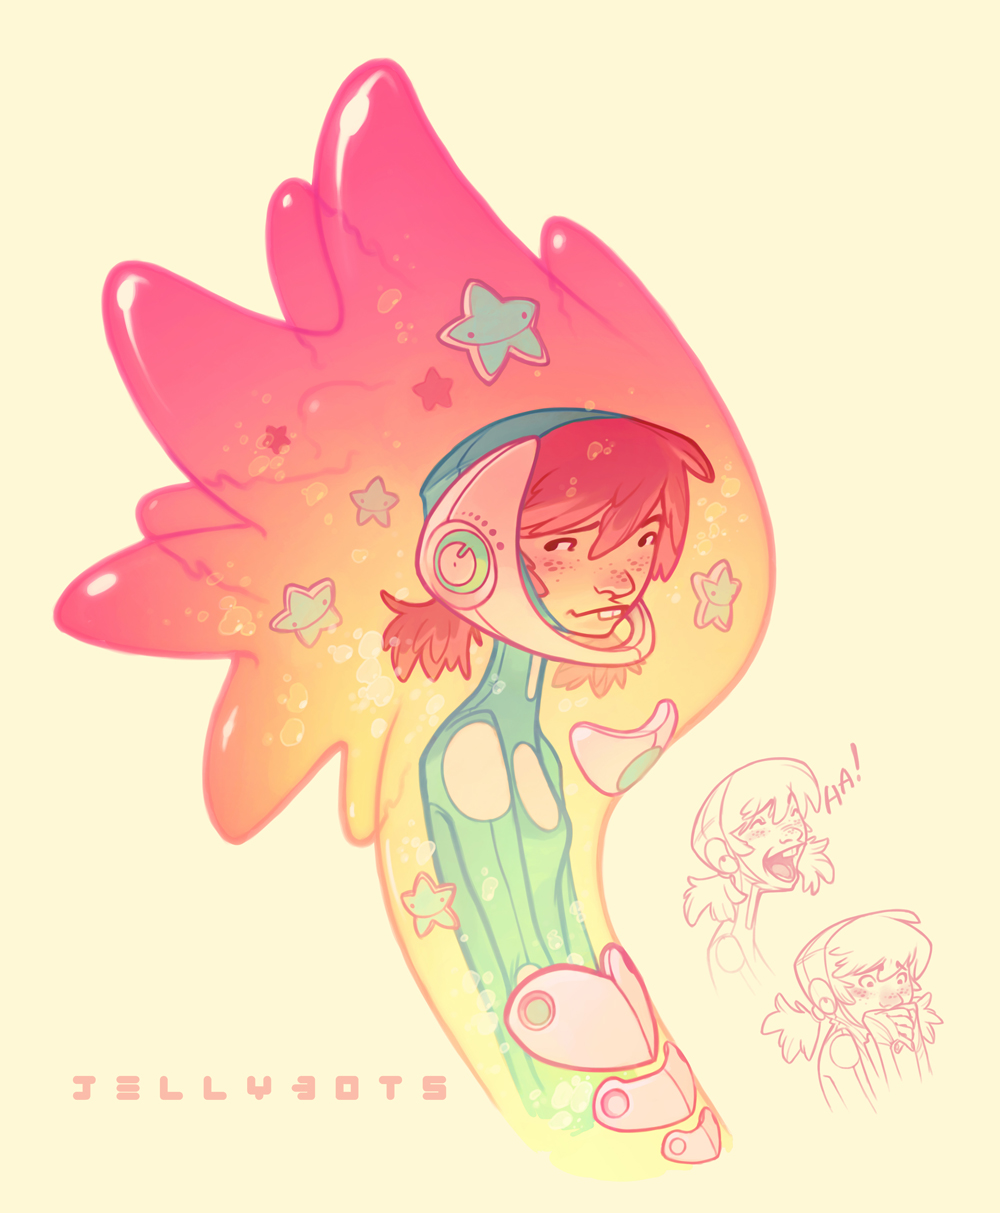 Jellybots: Lizzie by nicholaskole